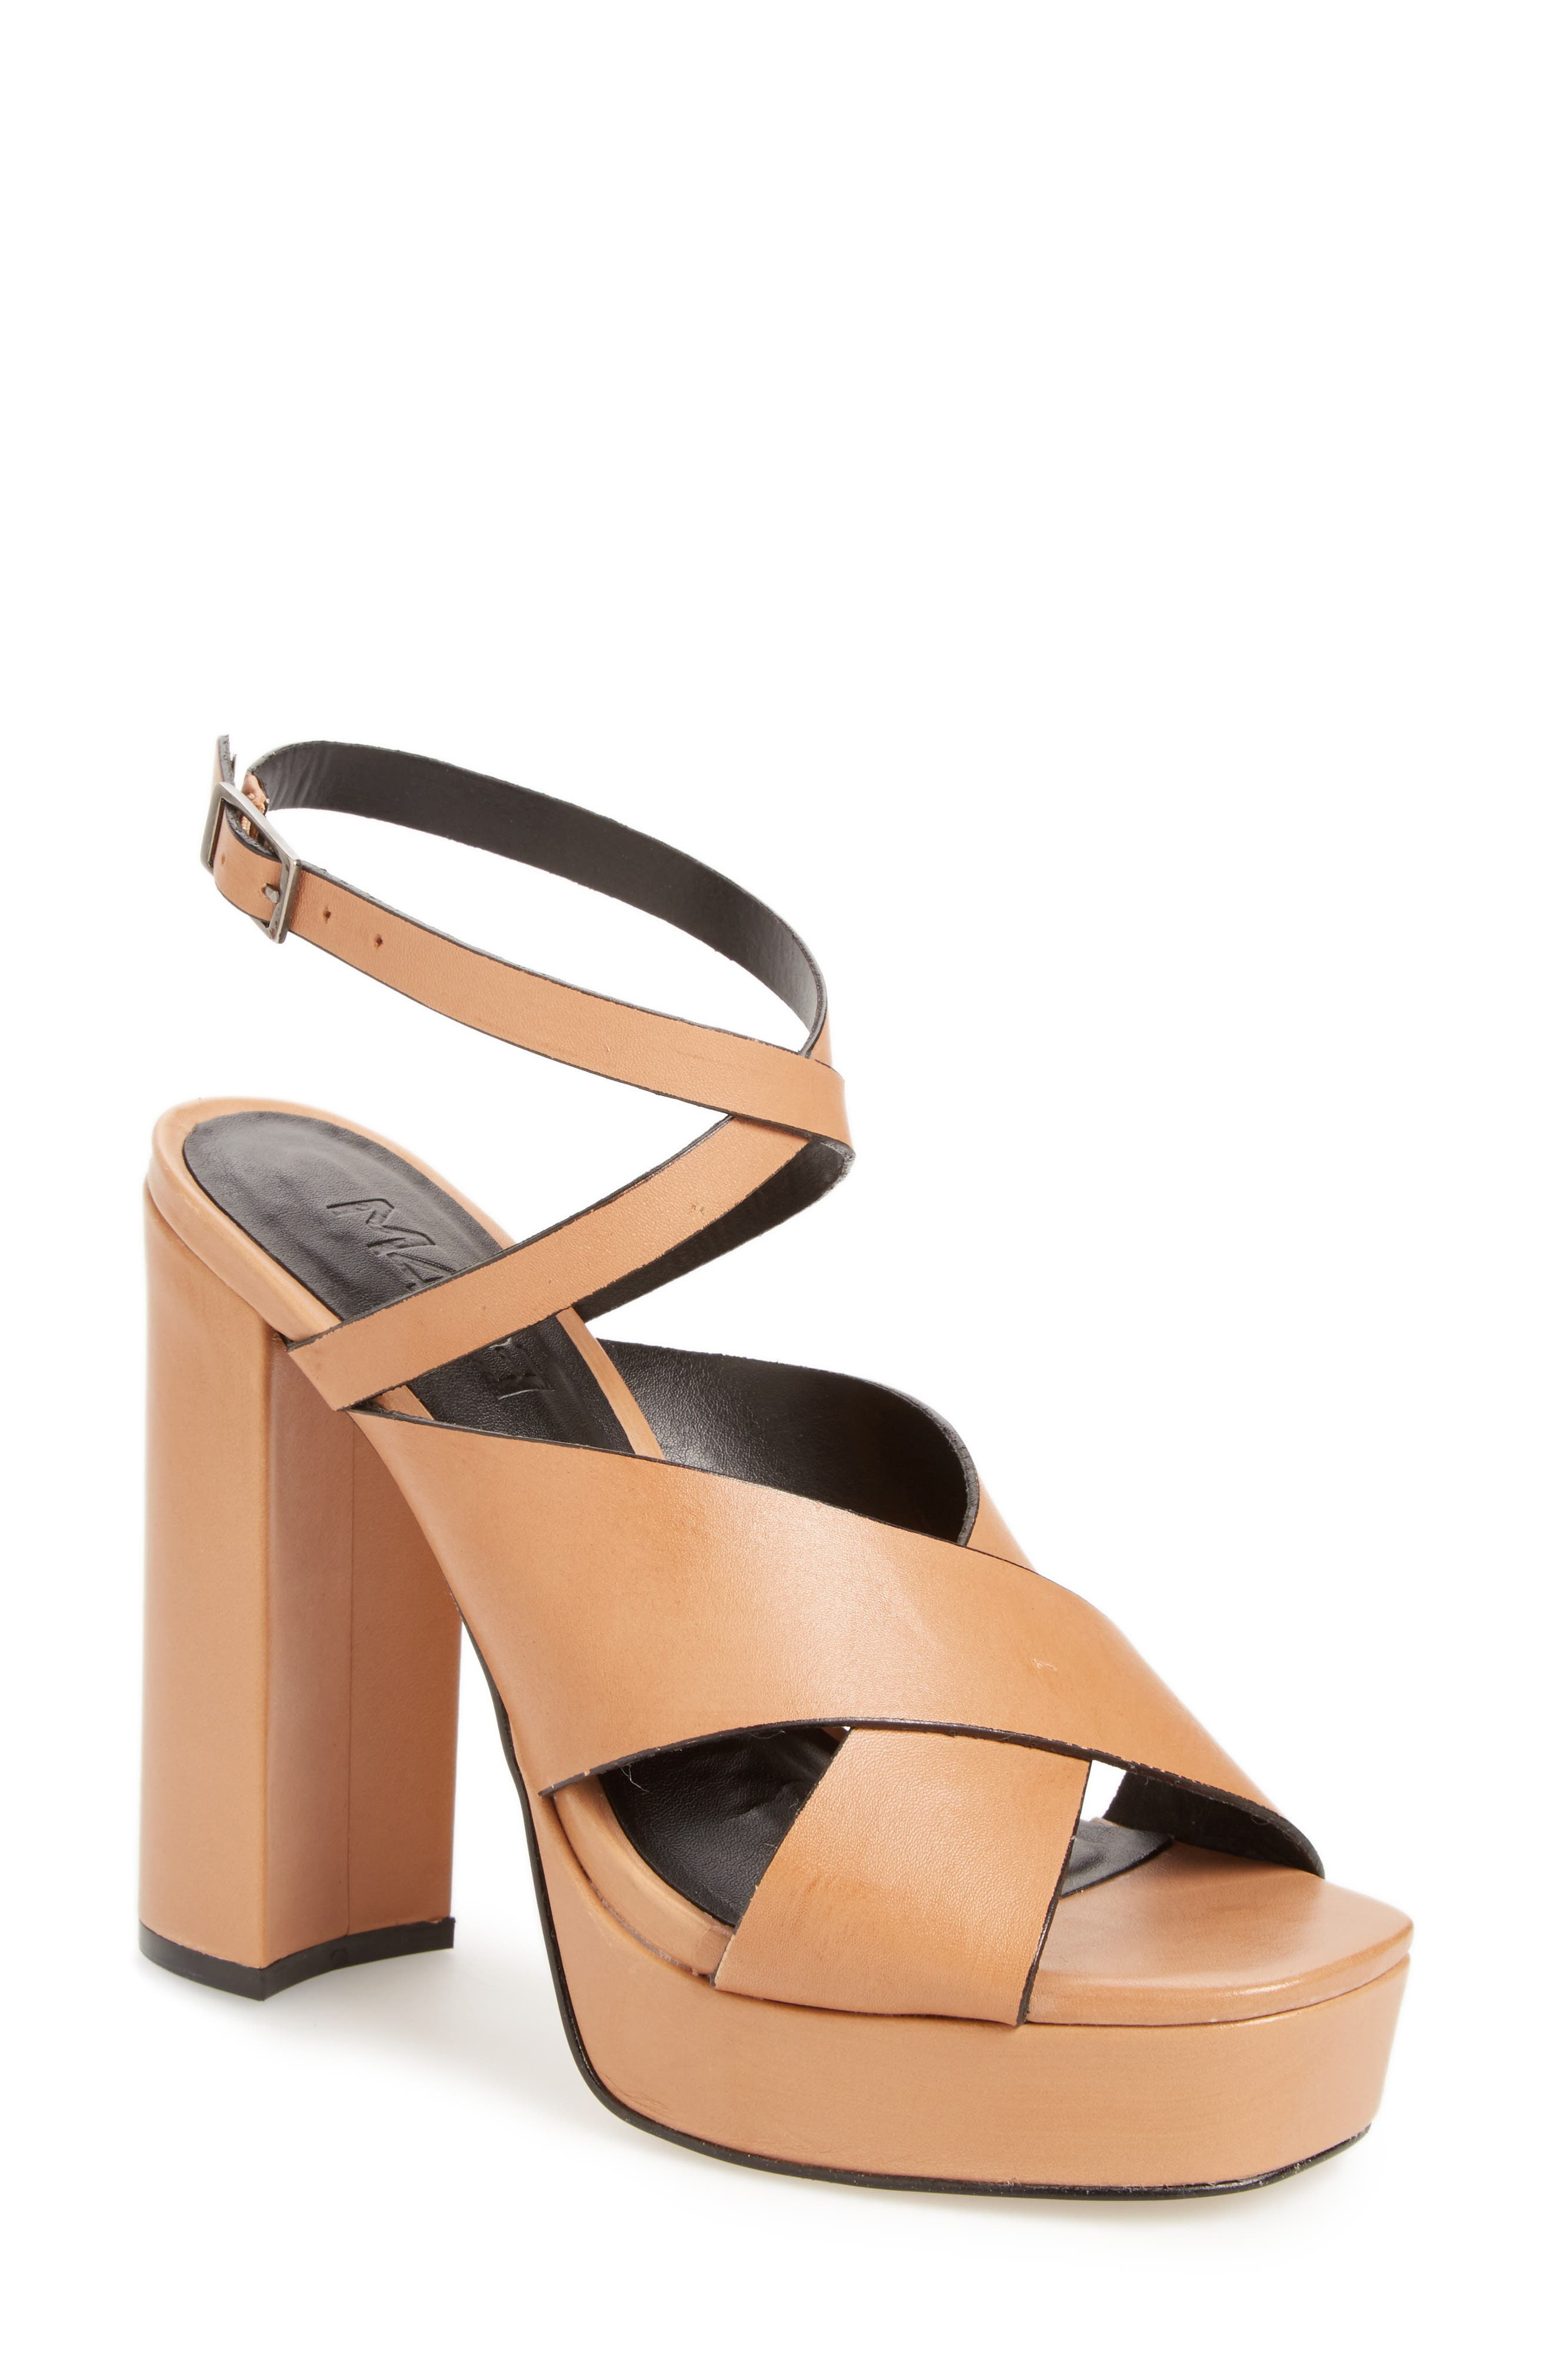 M4D3 FOOTWEAR M4D3 Priscilla Wraparound Platform Sandal